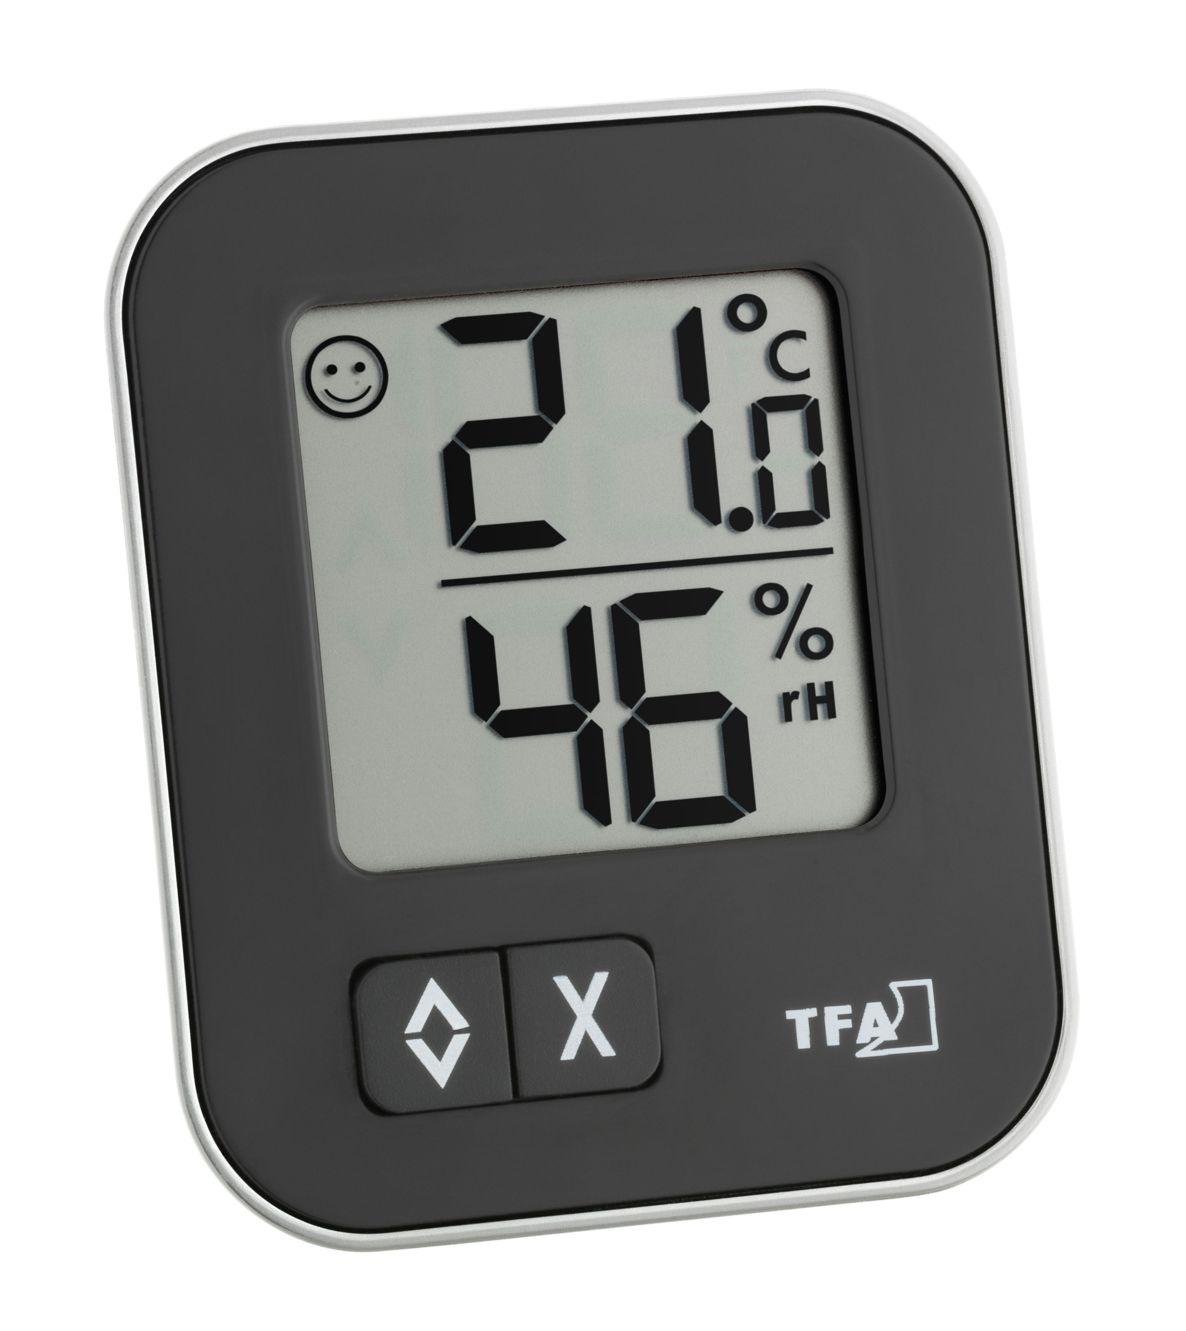 Digitales Thermo-Hygrometer - MOXX